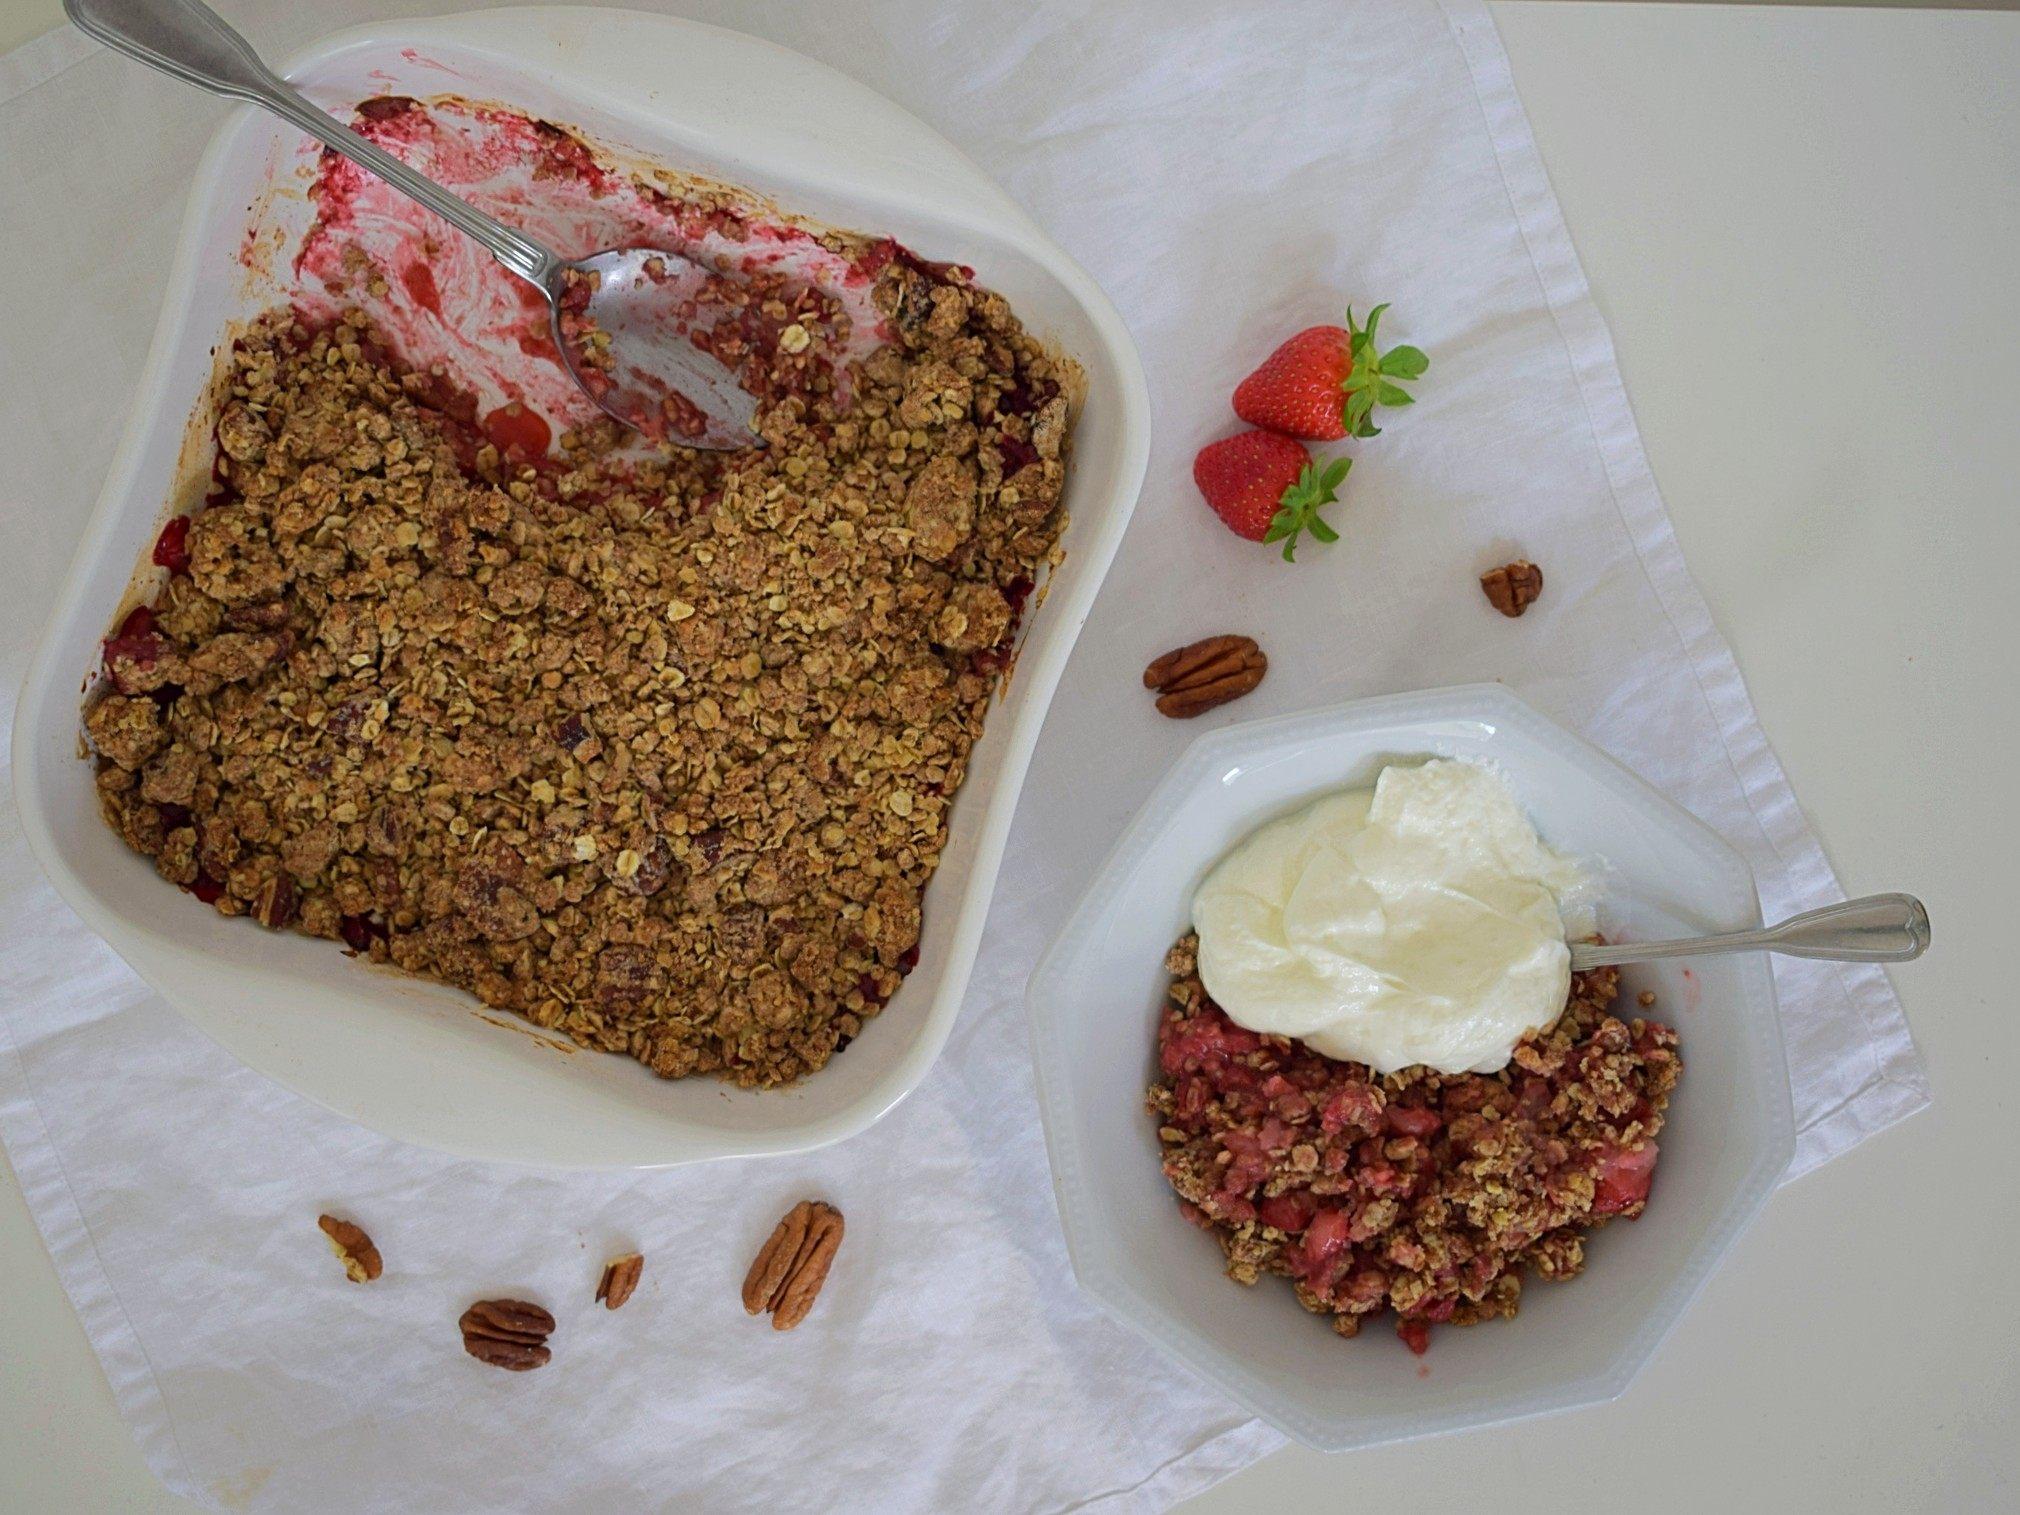 Vegan strawberry crumble